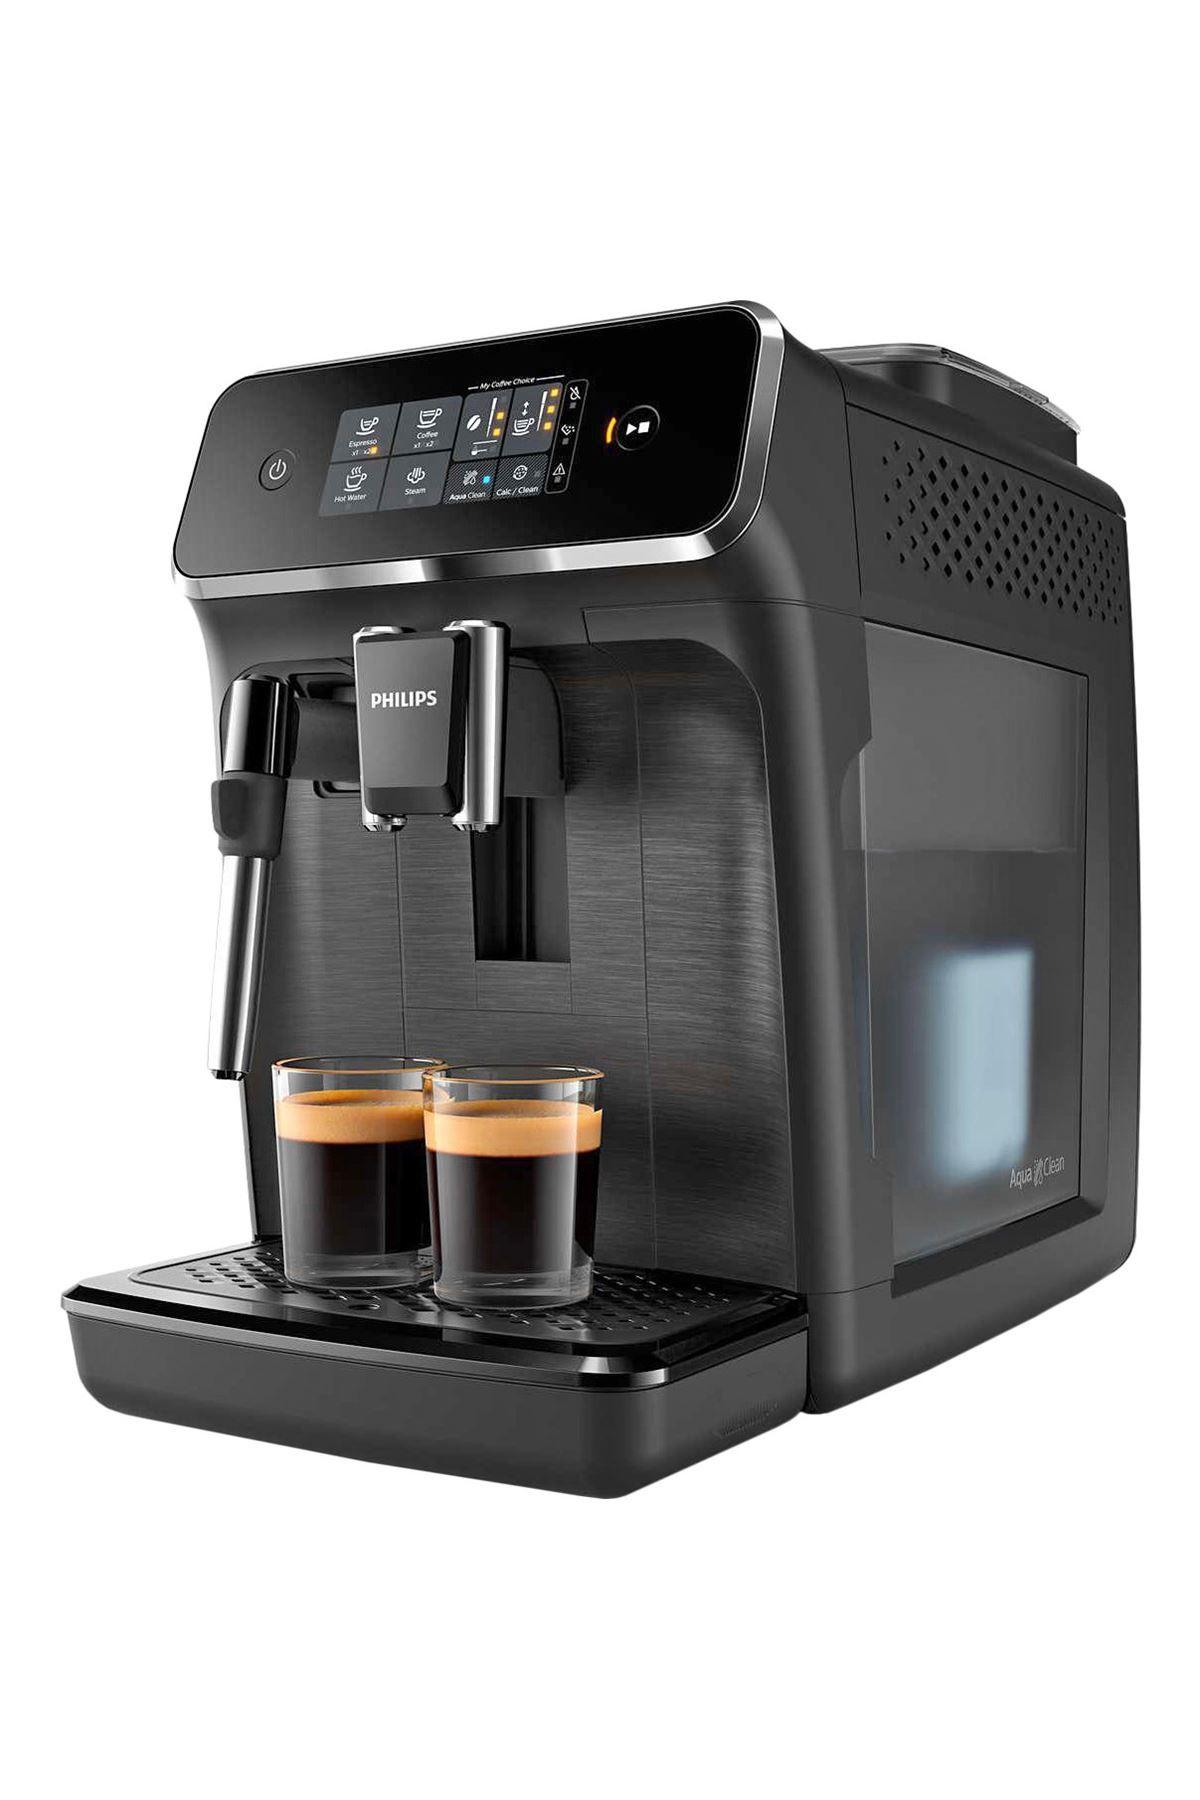 Pin By Lolimorcom On ماكينة قهوة اسبريسو Automatic Espresso Machine Coffee Machine Automatic Coffee Machine